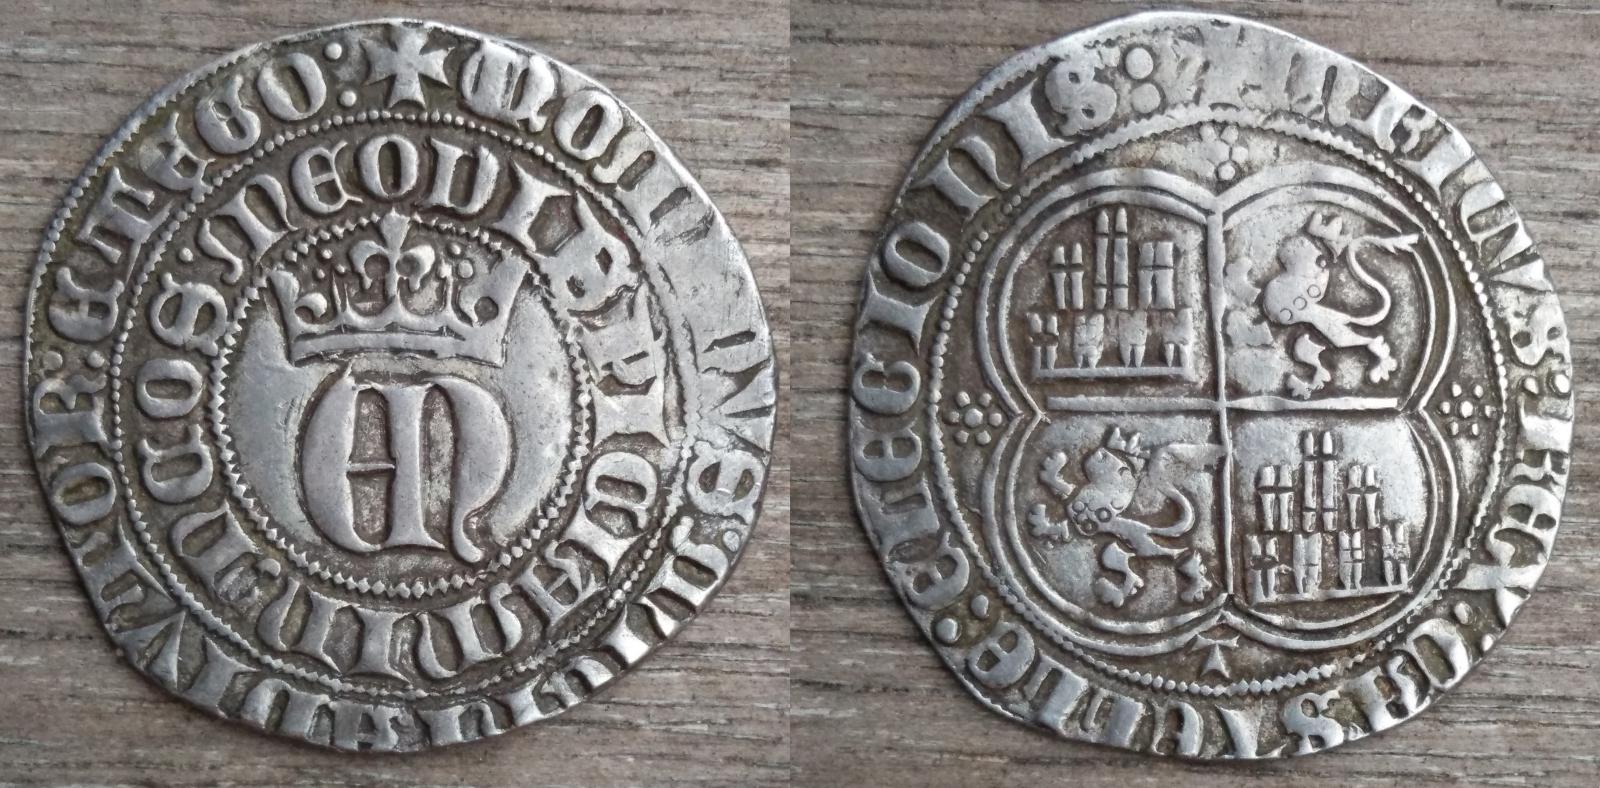 1 REAL Enrique II - Toledo (1373-1379) Wvaelc